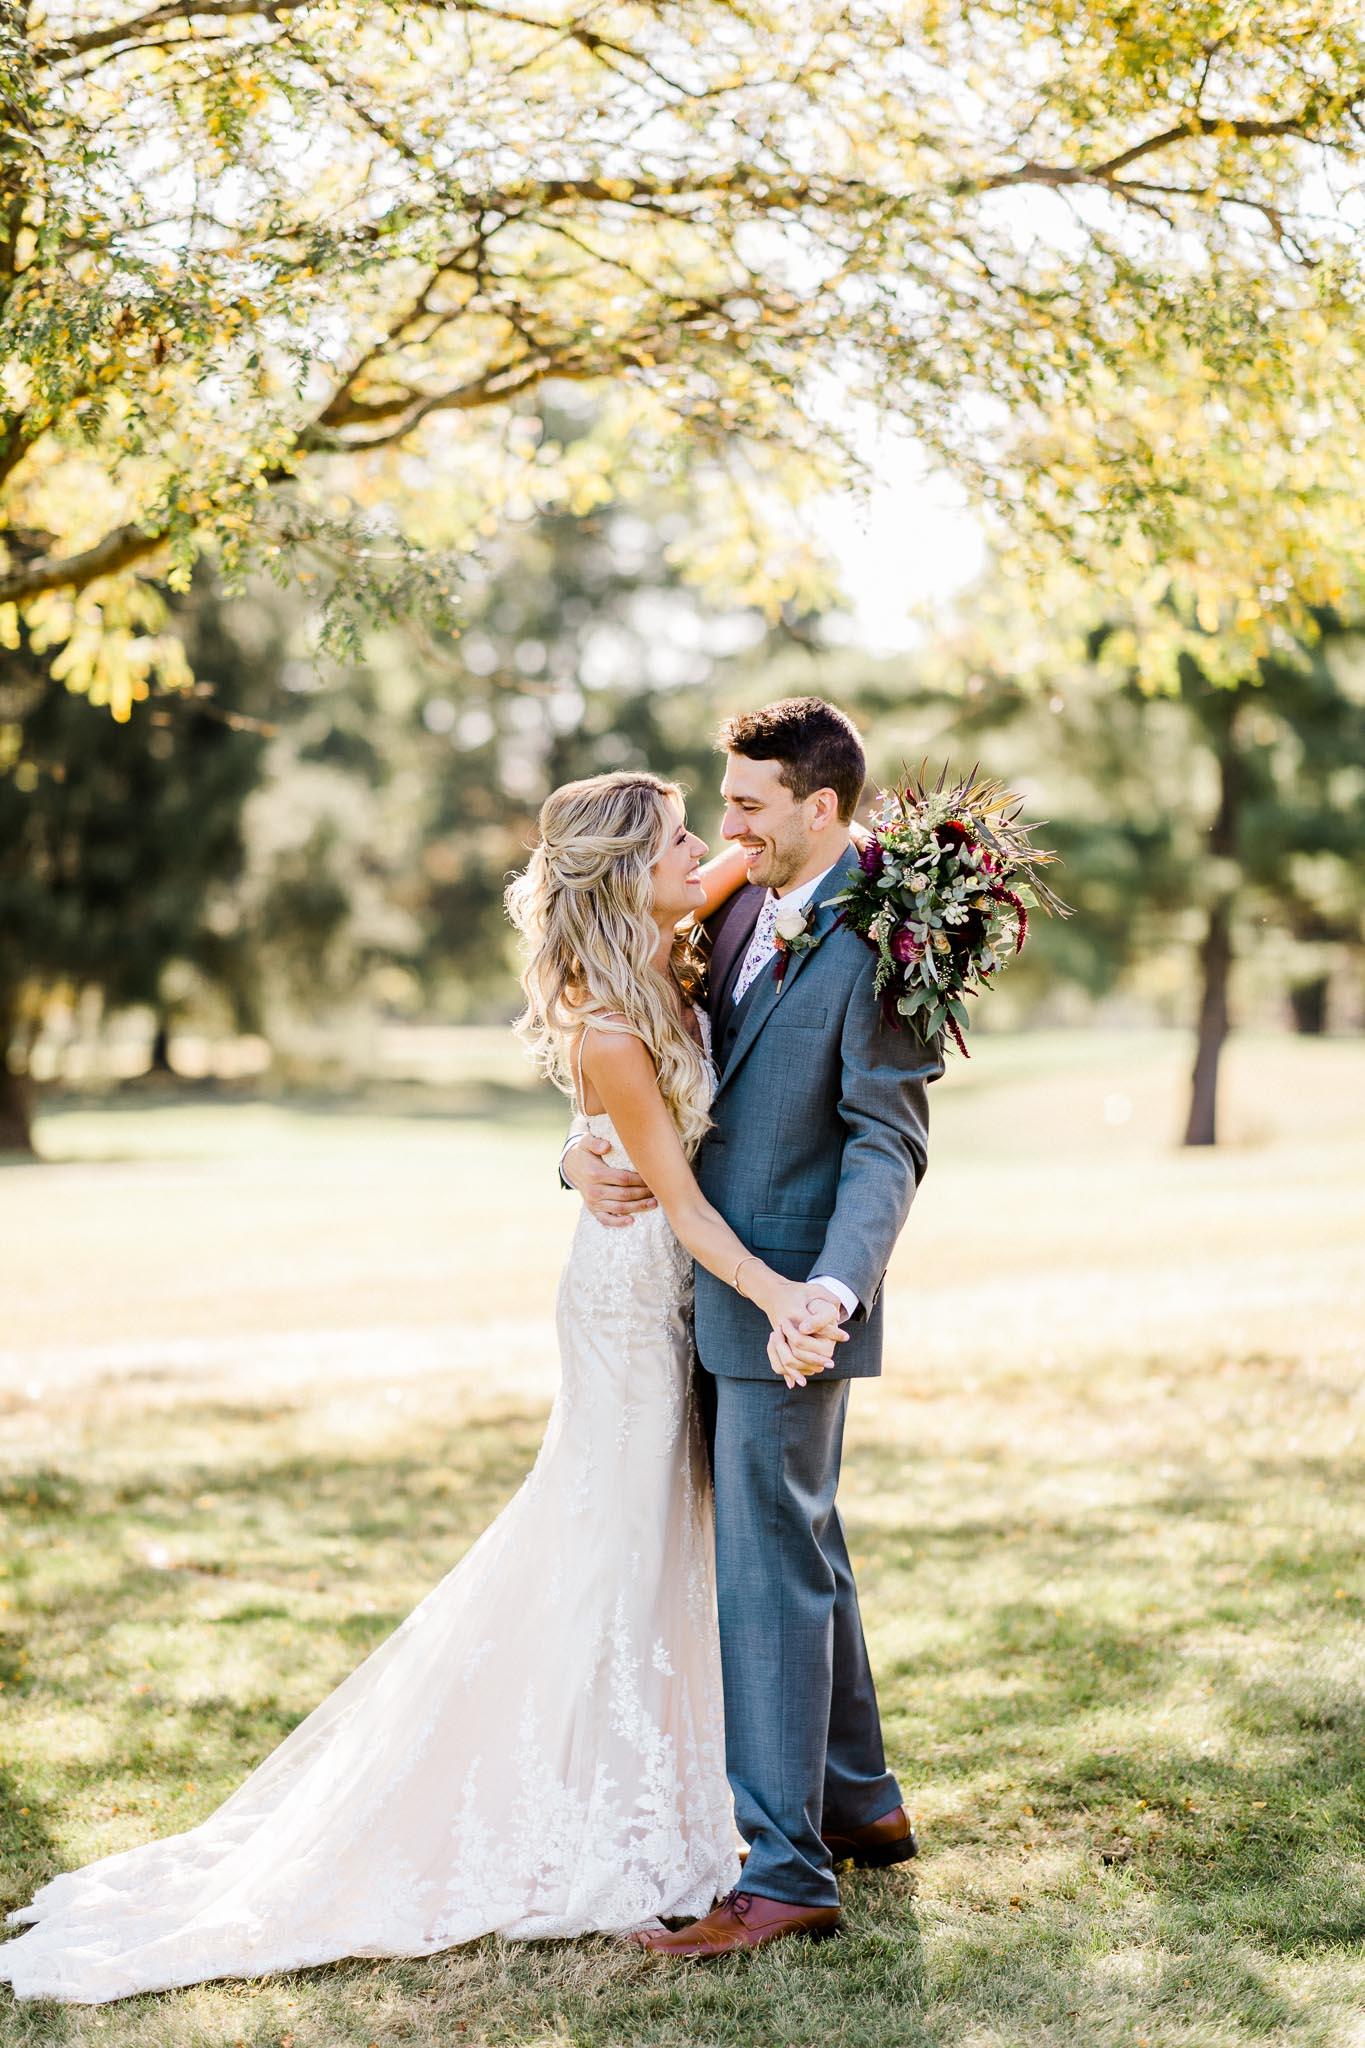 Frosty-Valley-September-Wedding-7512.jpg